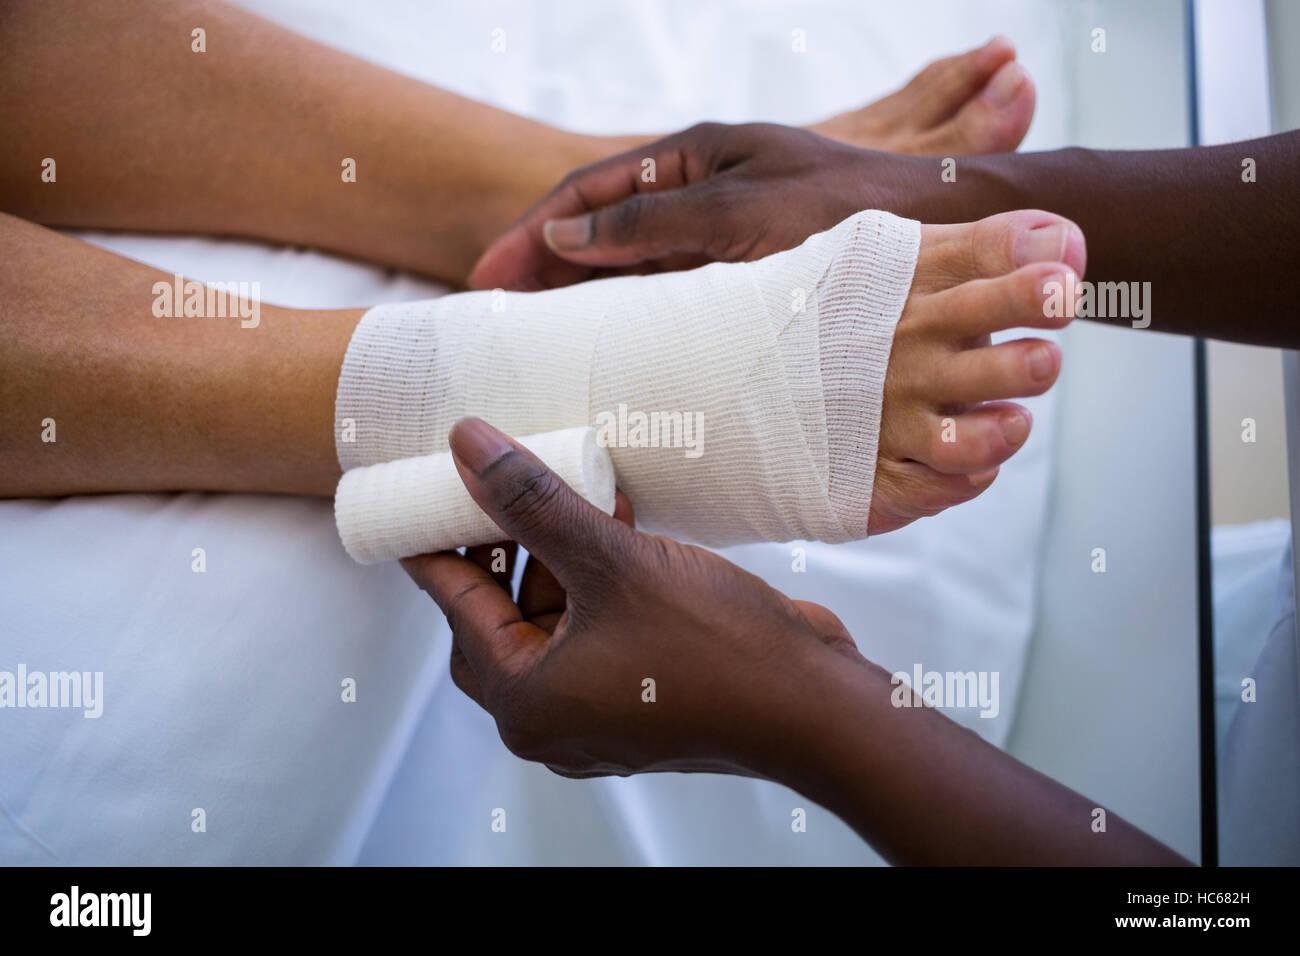 Doctor bandaging patients leg - Stock Image